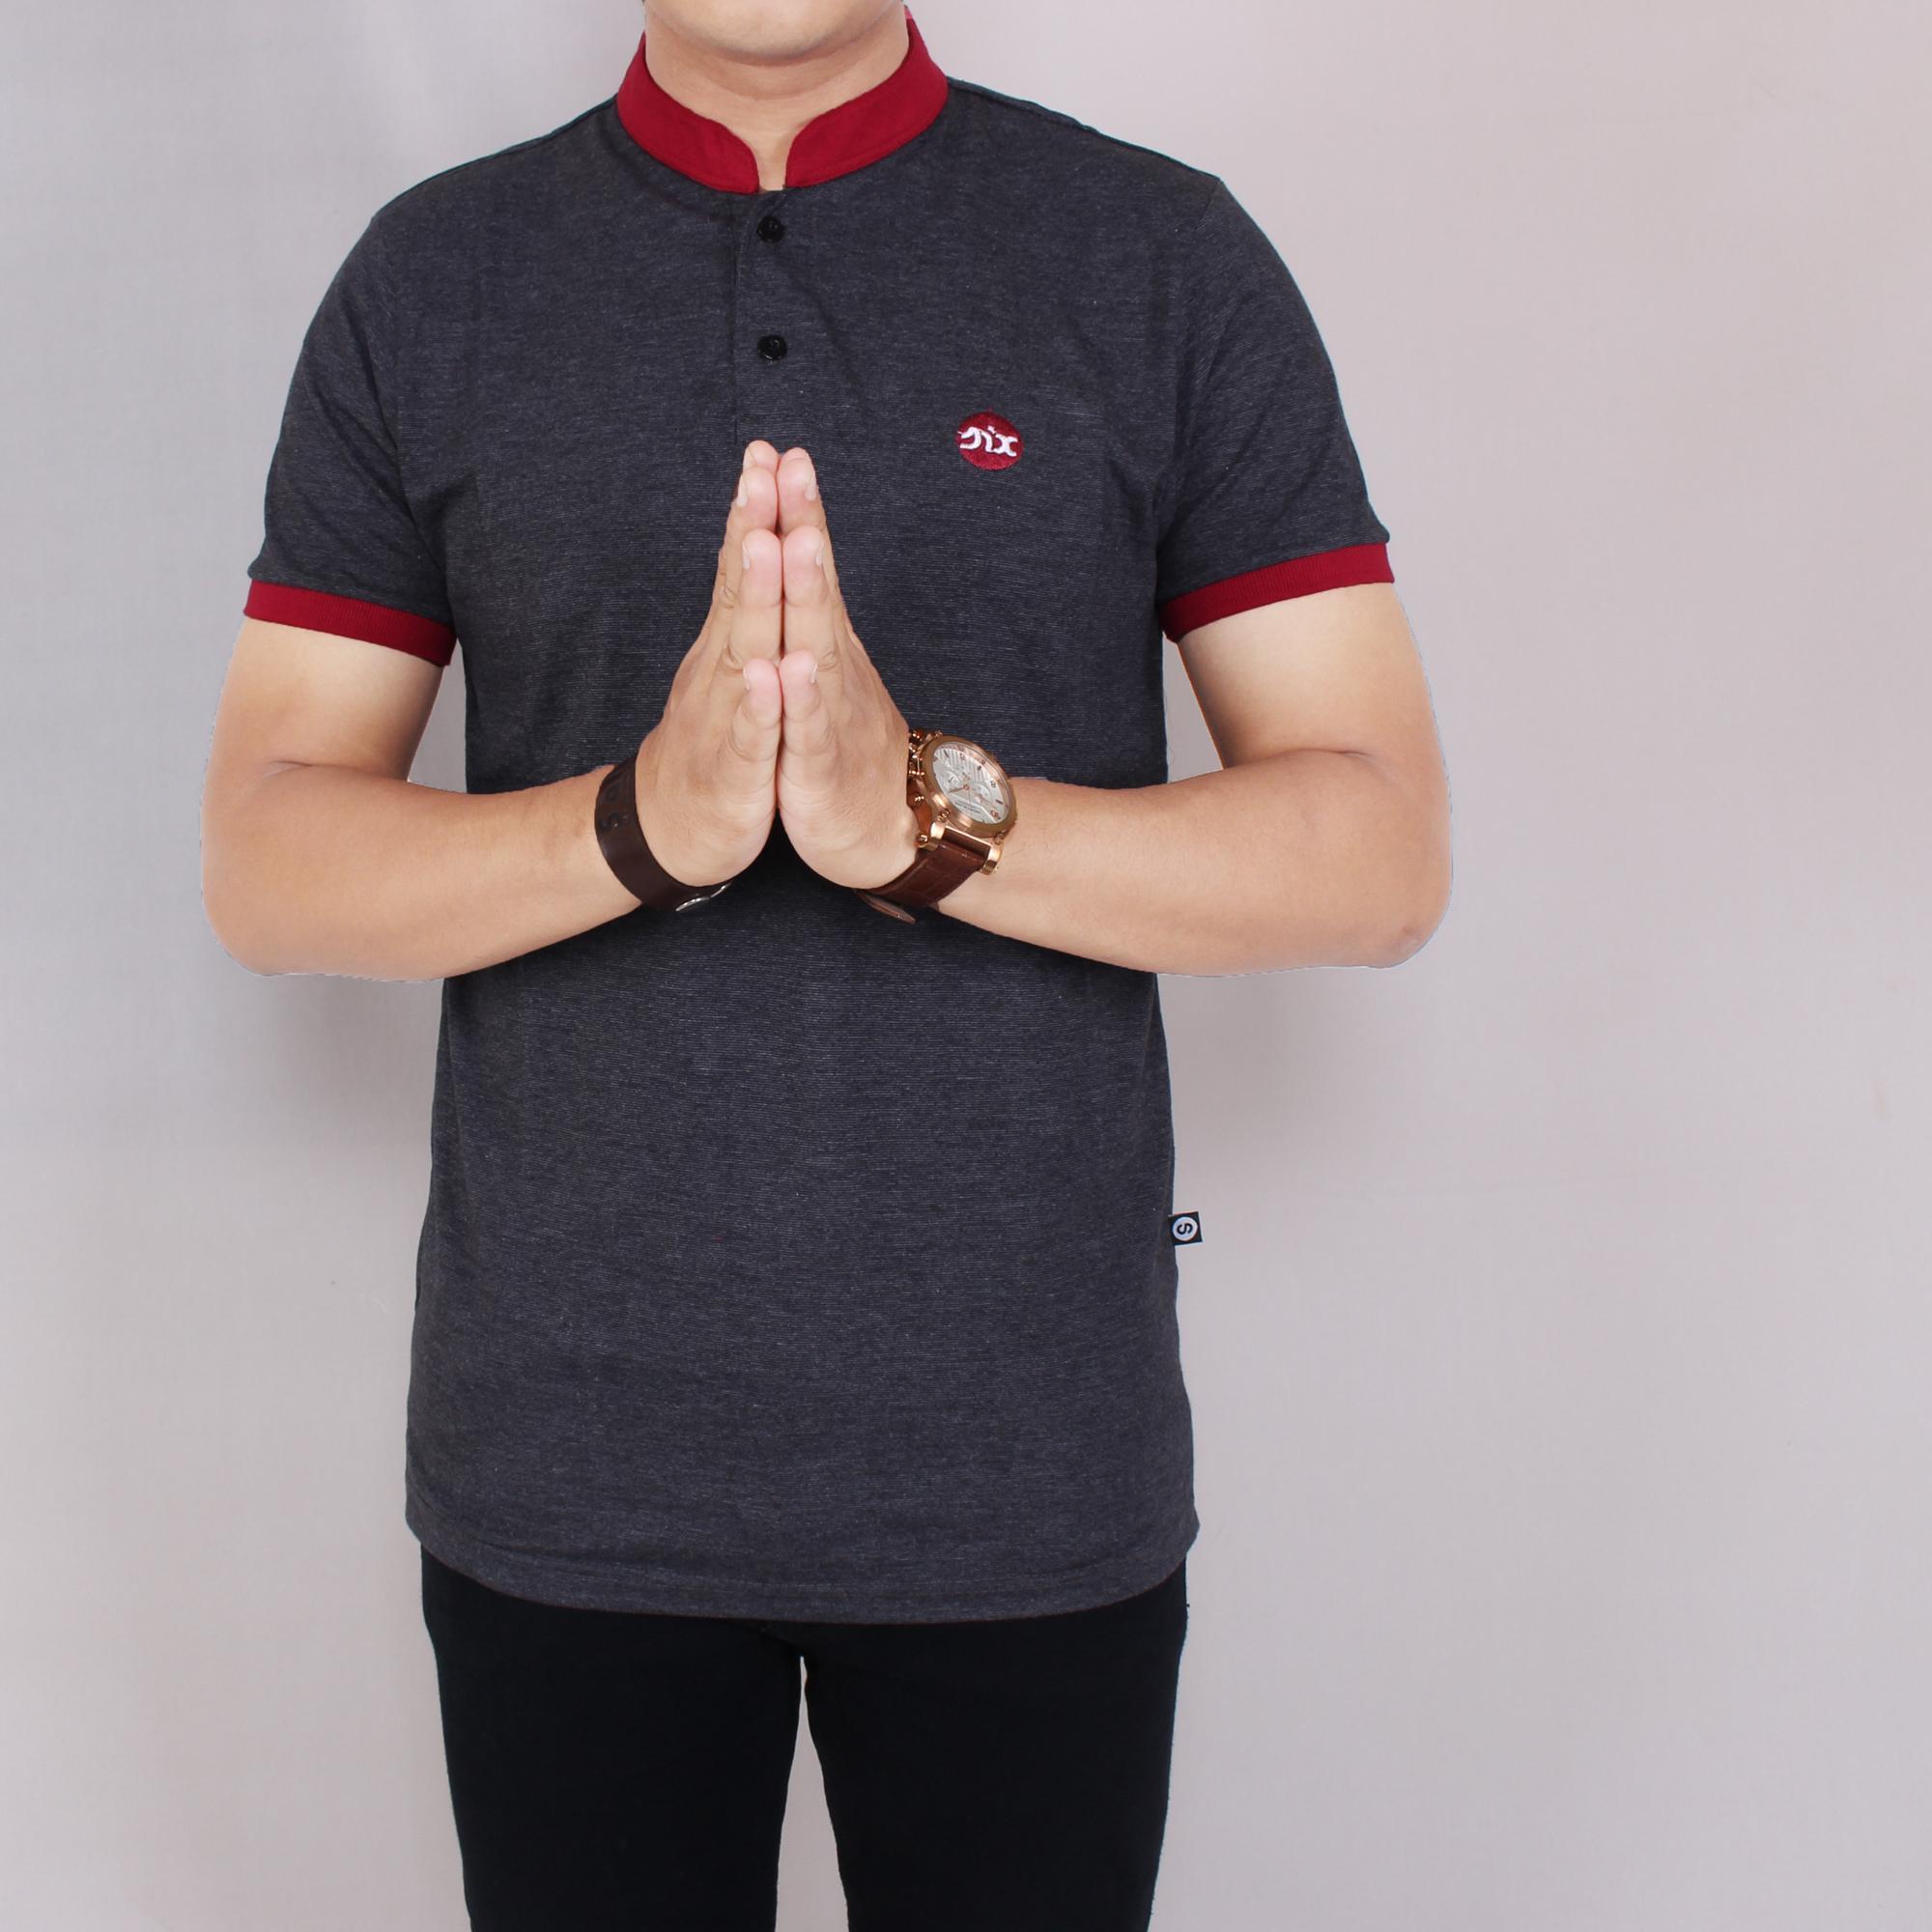 Zoeystore1 5748 Kaos Polo Six Pria Lengan Pendek Baju Kaos Polo Sanghai Cowok Formal Red Mix Gray